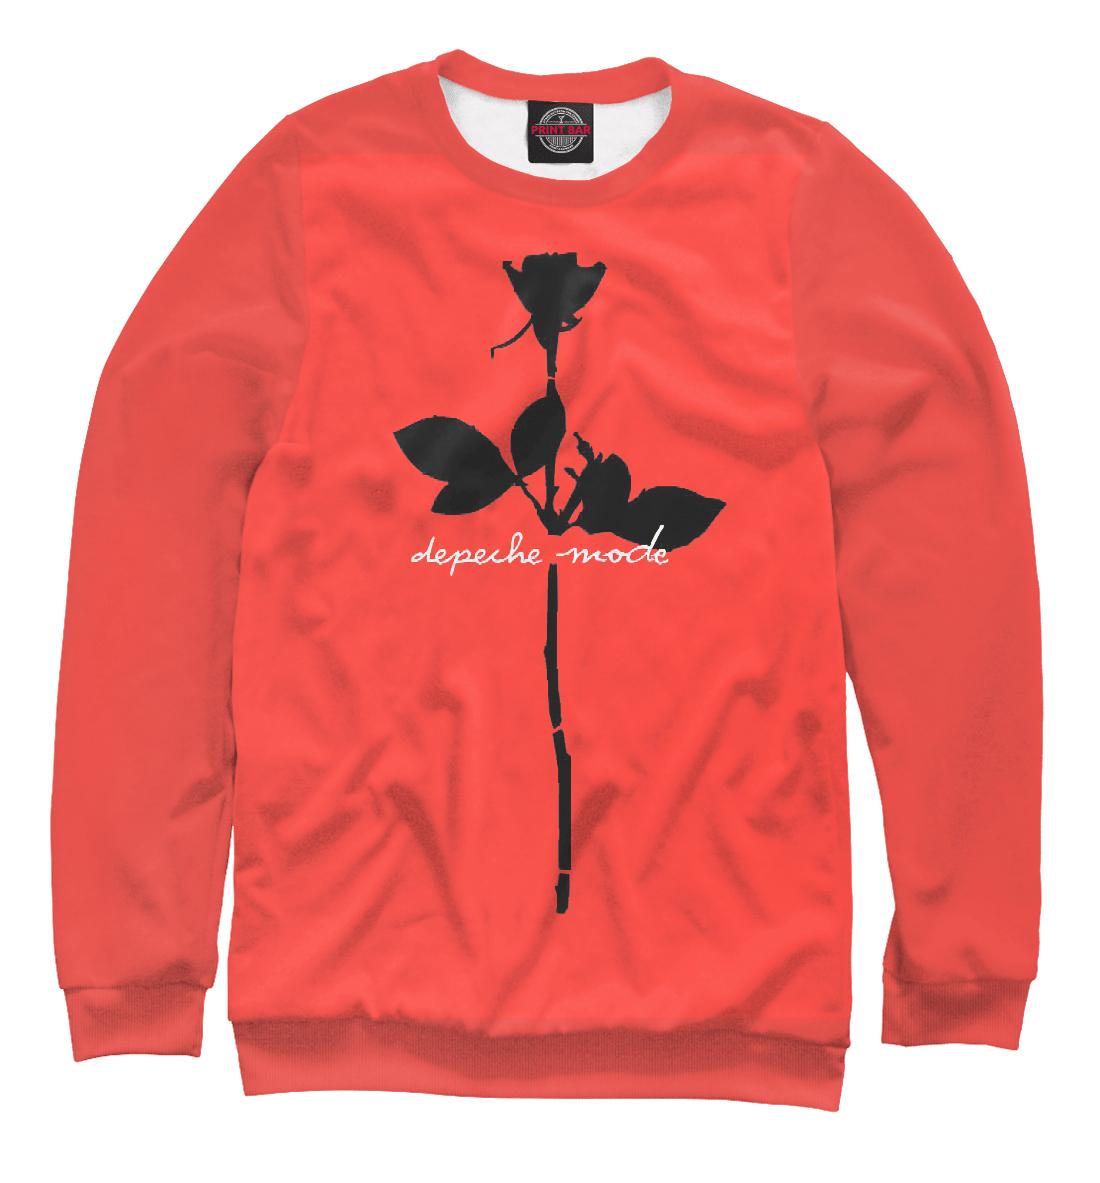 Купить Depeche Mode, Printbar, Свитшоты, DPM-431121-swi-1